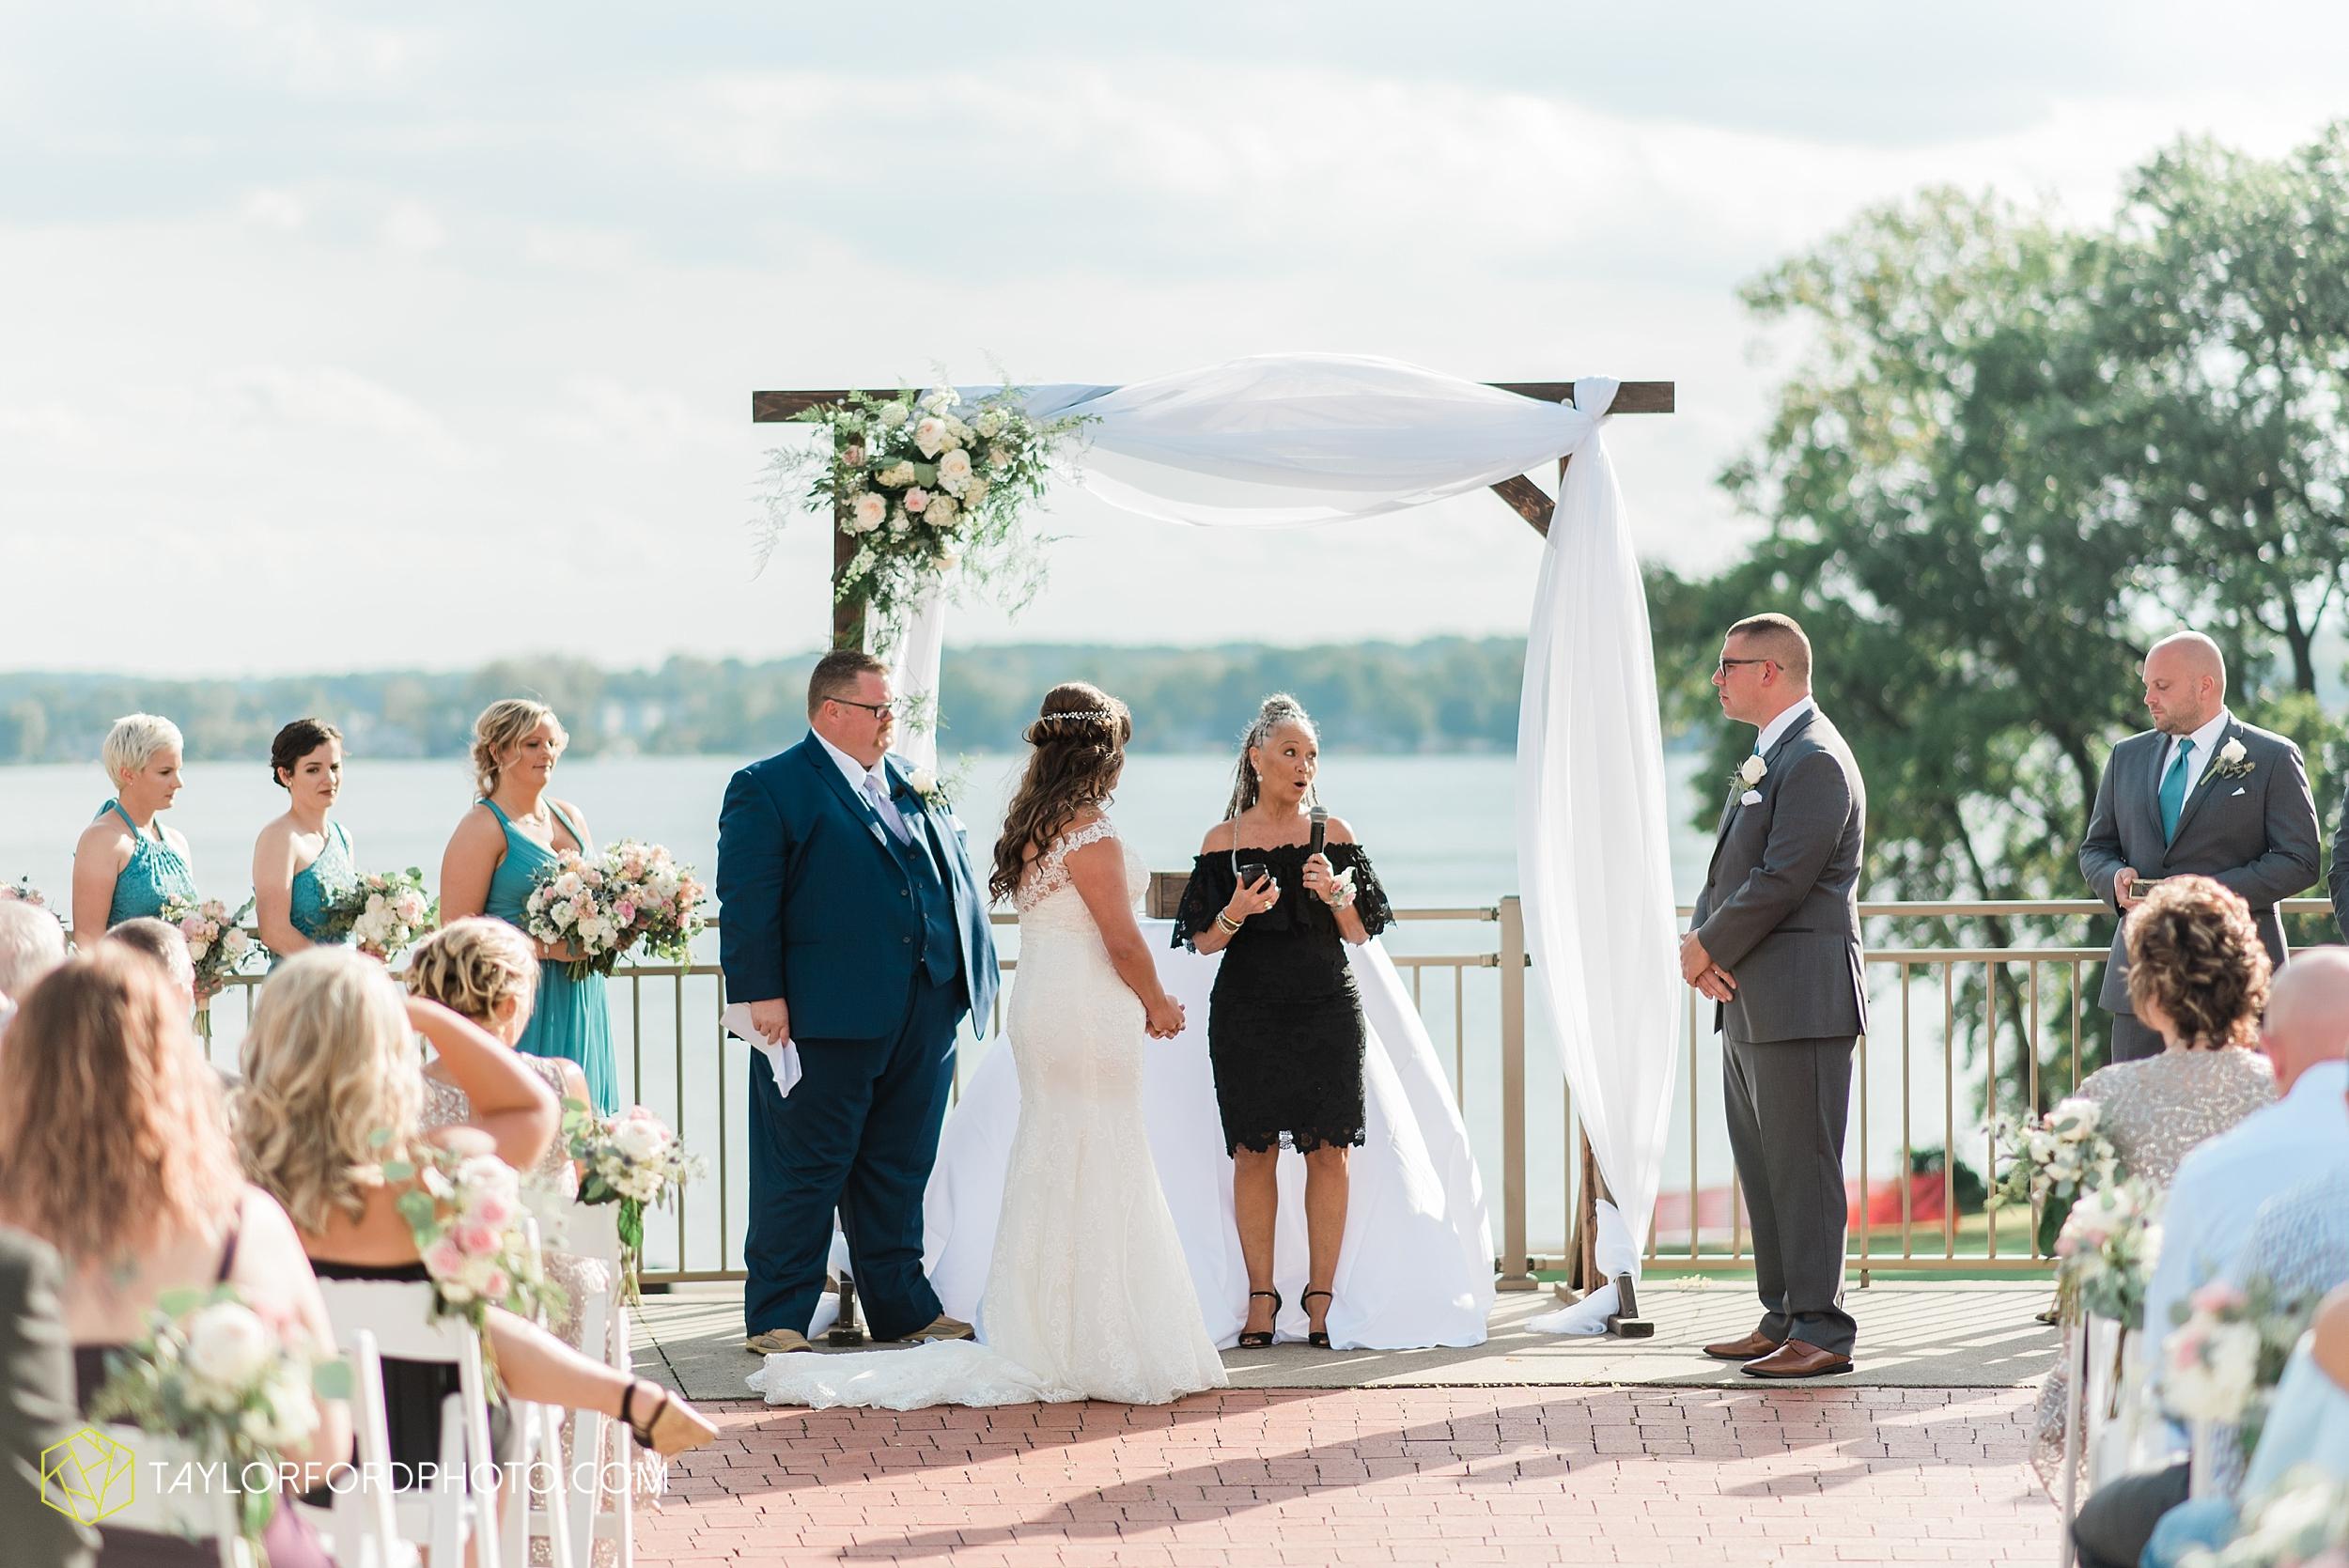 brook-loren-pokagon-state-park-angola-indiana-potowatomi-inn-wedding-fall-lake-james-photographer-taylor-ford-photography_0520.jpg